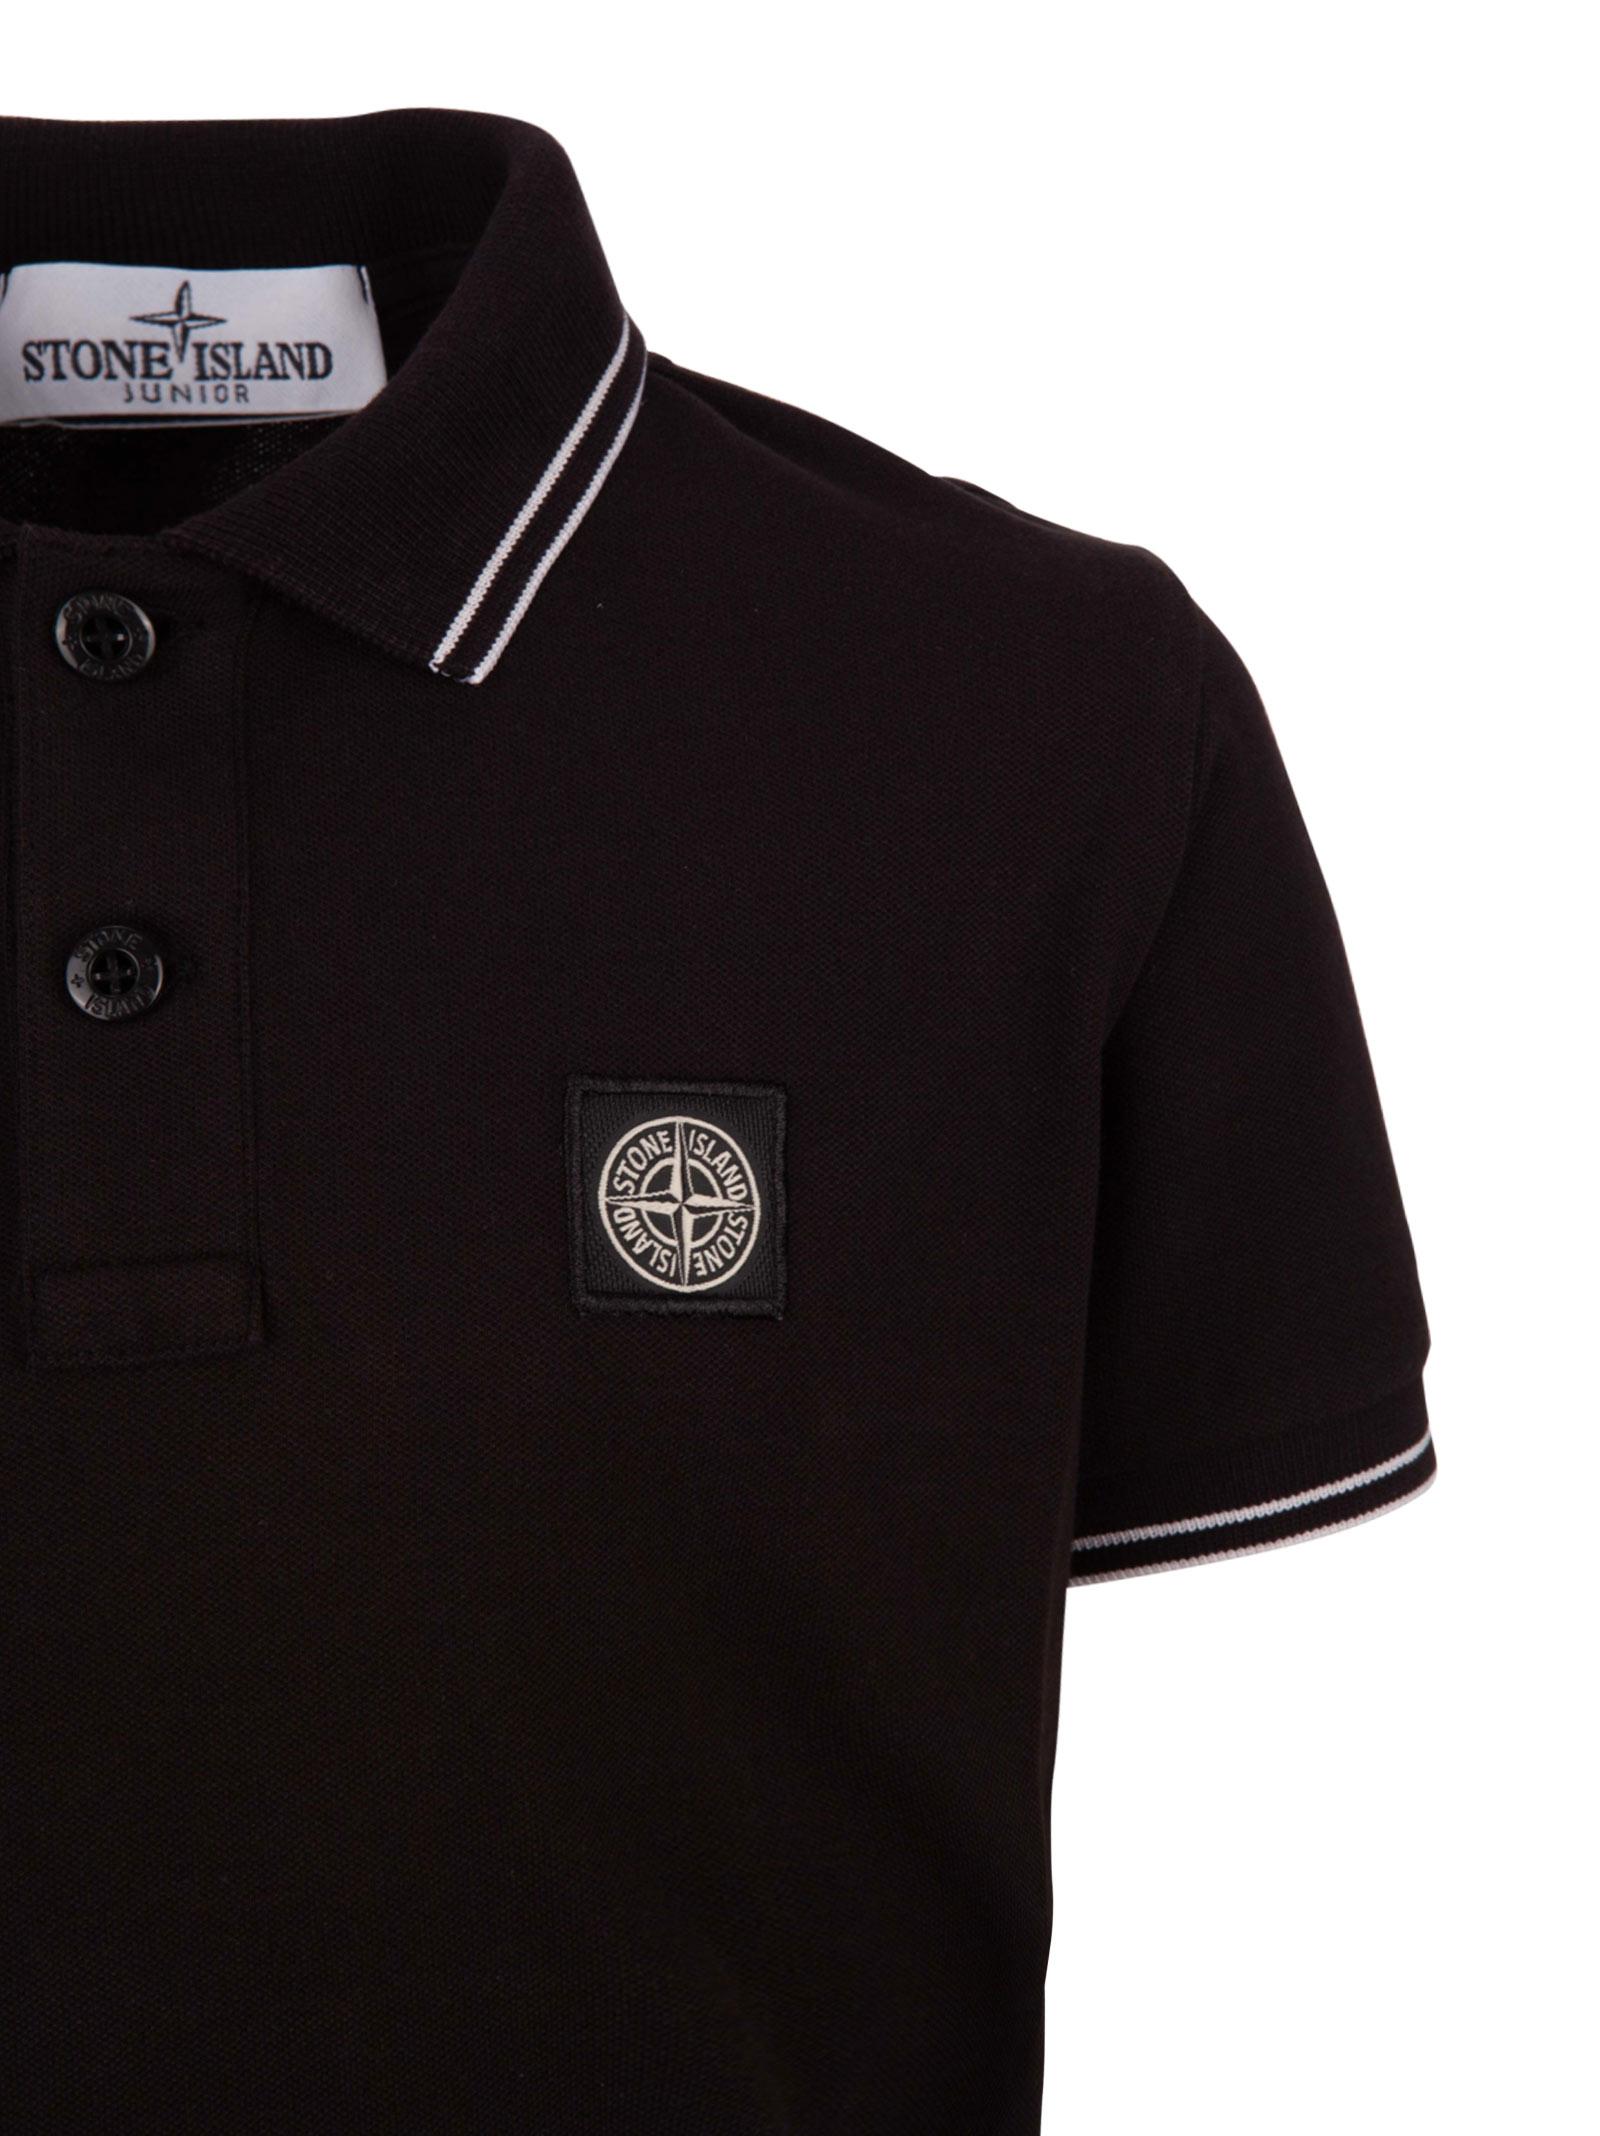 15635205097 Stone Island Kids polo shirt Stone Island Junior | 2 | 701621348V0029